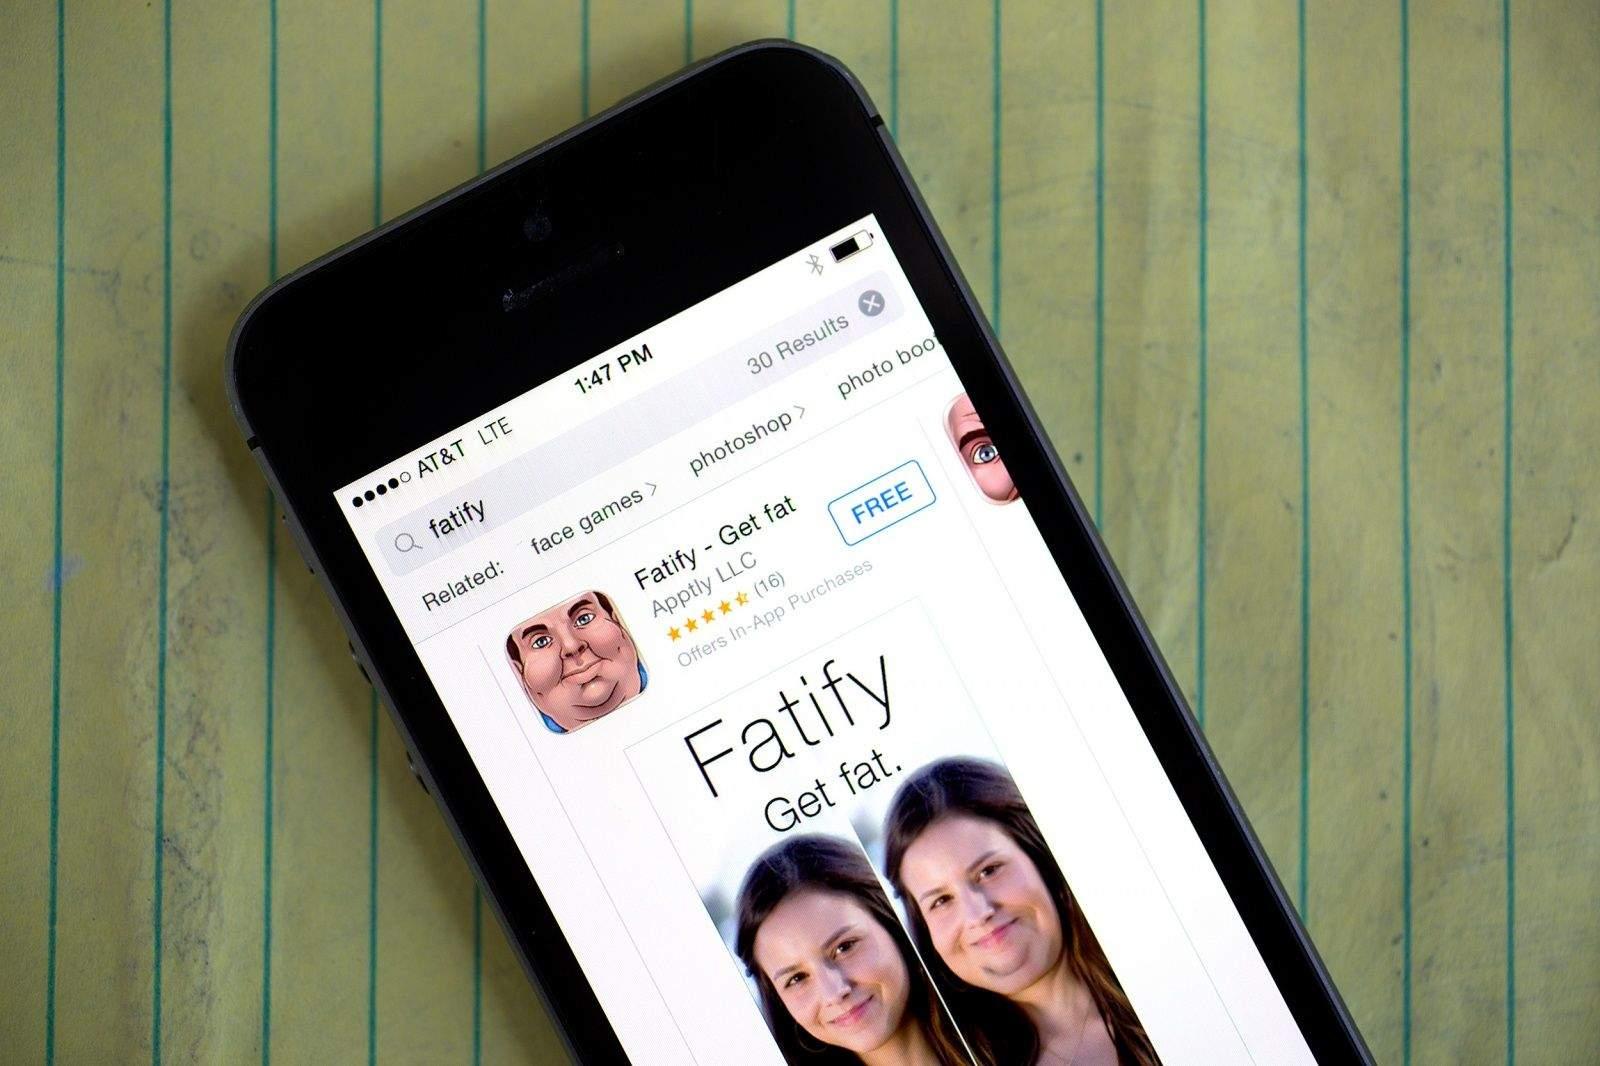 Fat Shaming Apps Slammed For Harming Kids Cult Of Mac